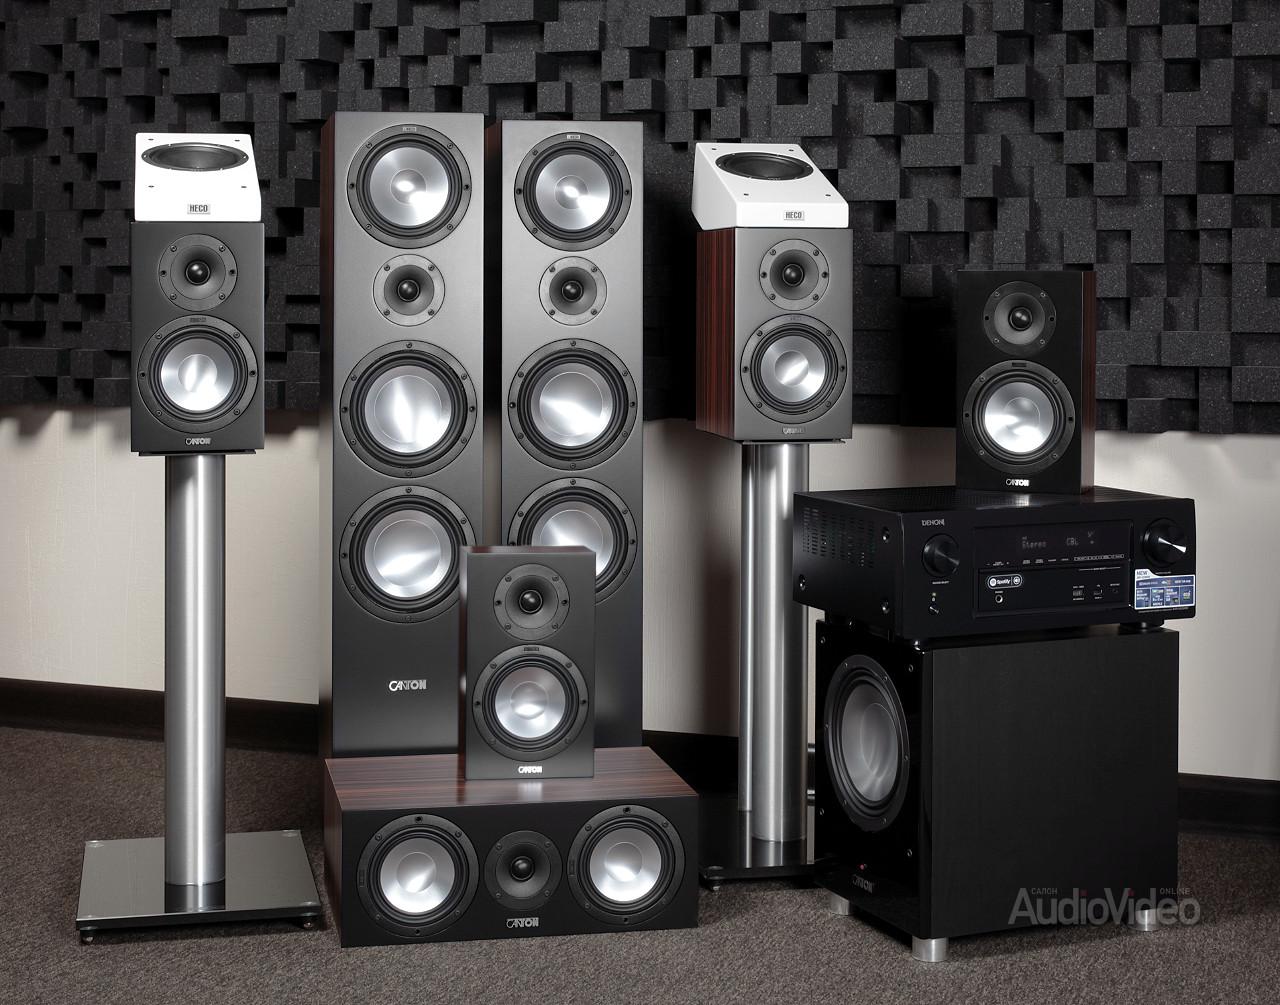 AV-ресивер Denon AVR-X2300W и комплект акустики Canton GLE